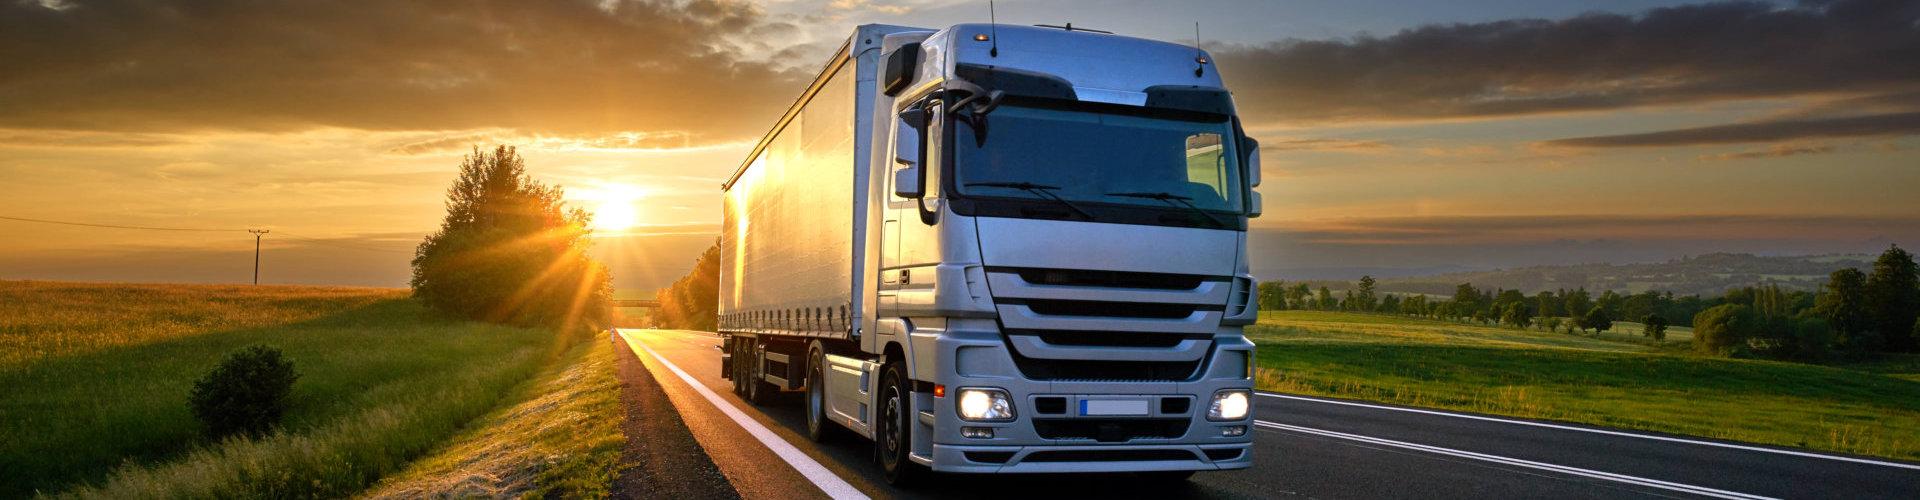 portrait of a truck